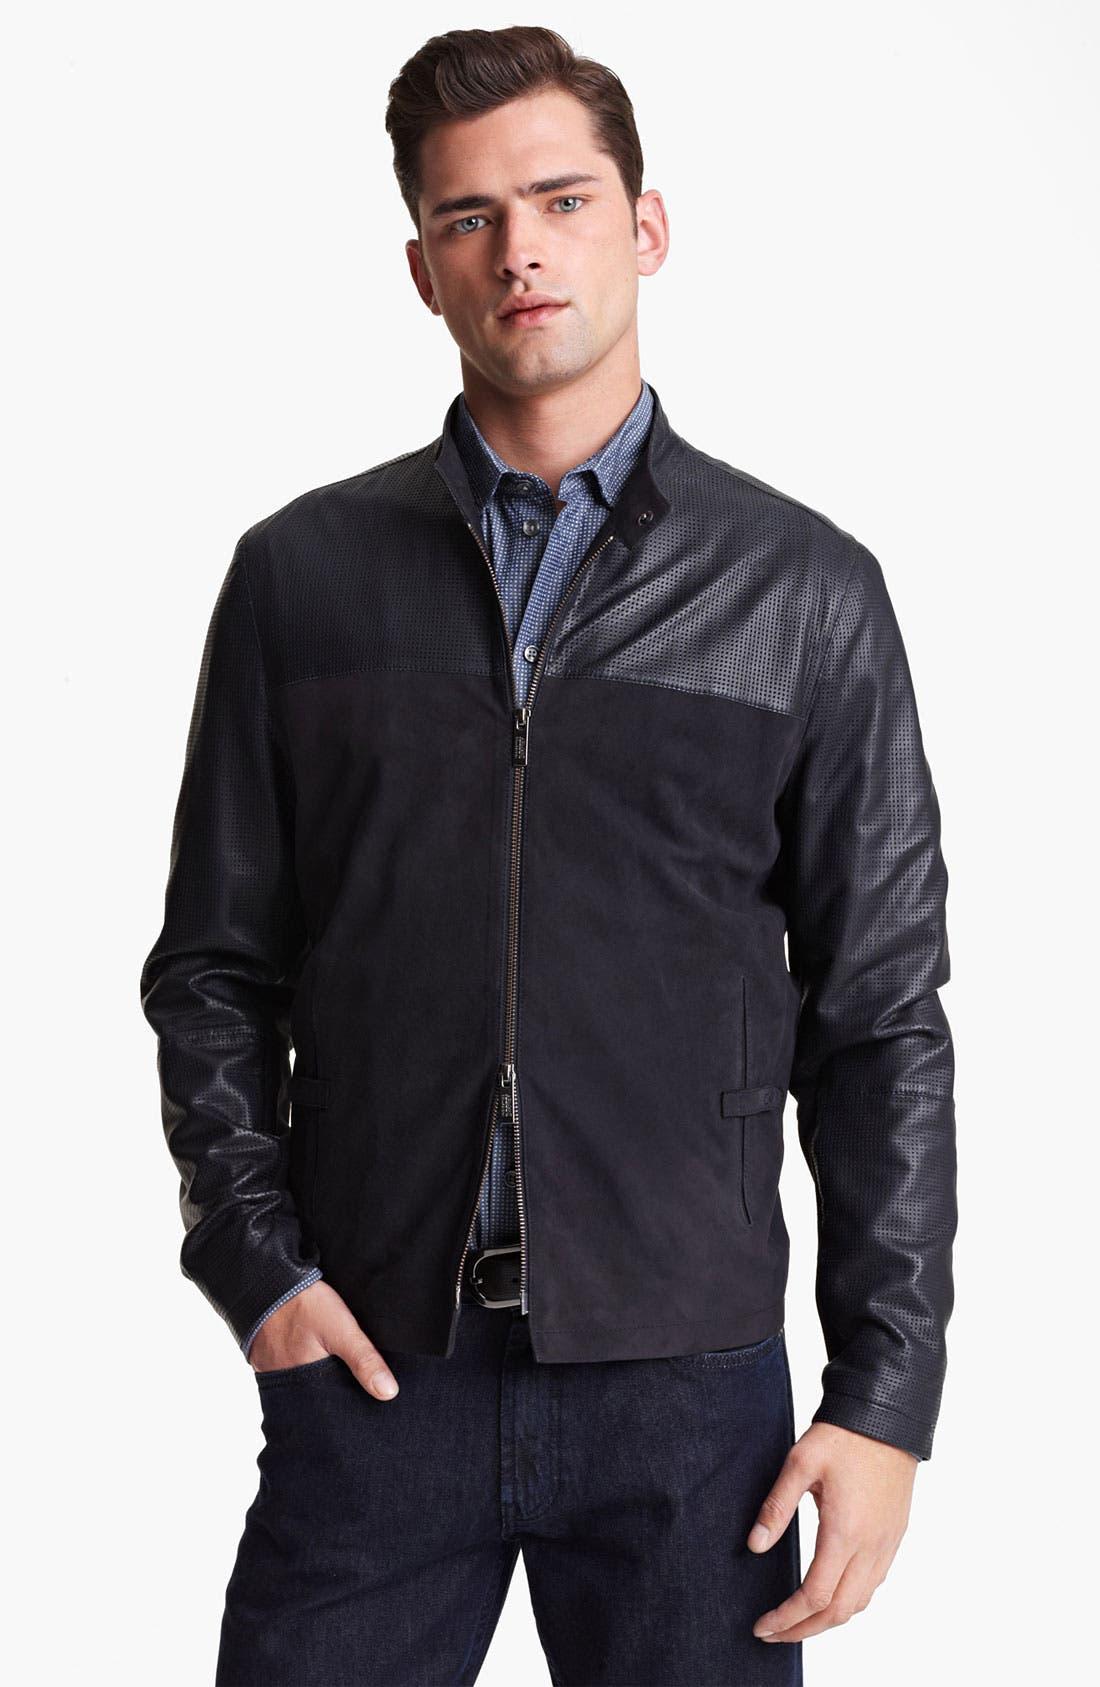 Alternate Image 1 Selected - Armani Collezioni Perforated Lambskin Leather Jacket